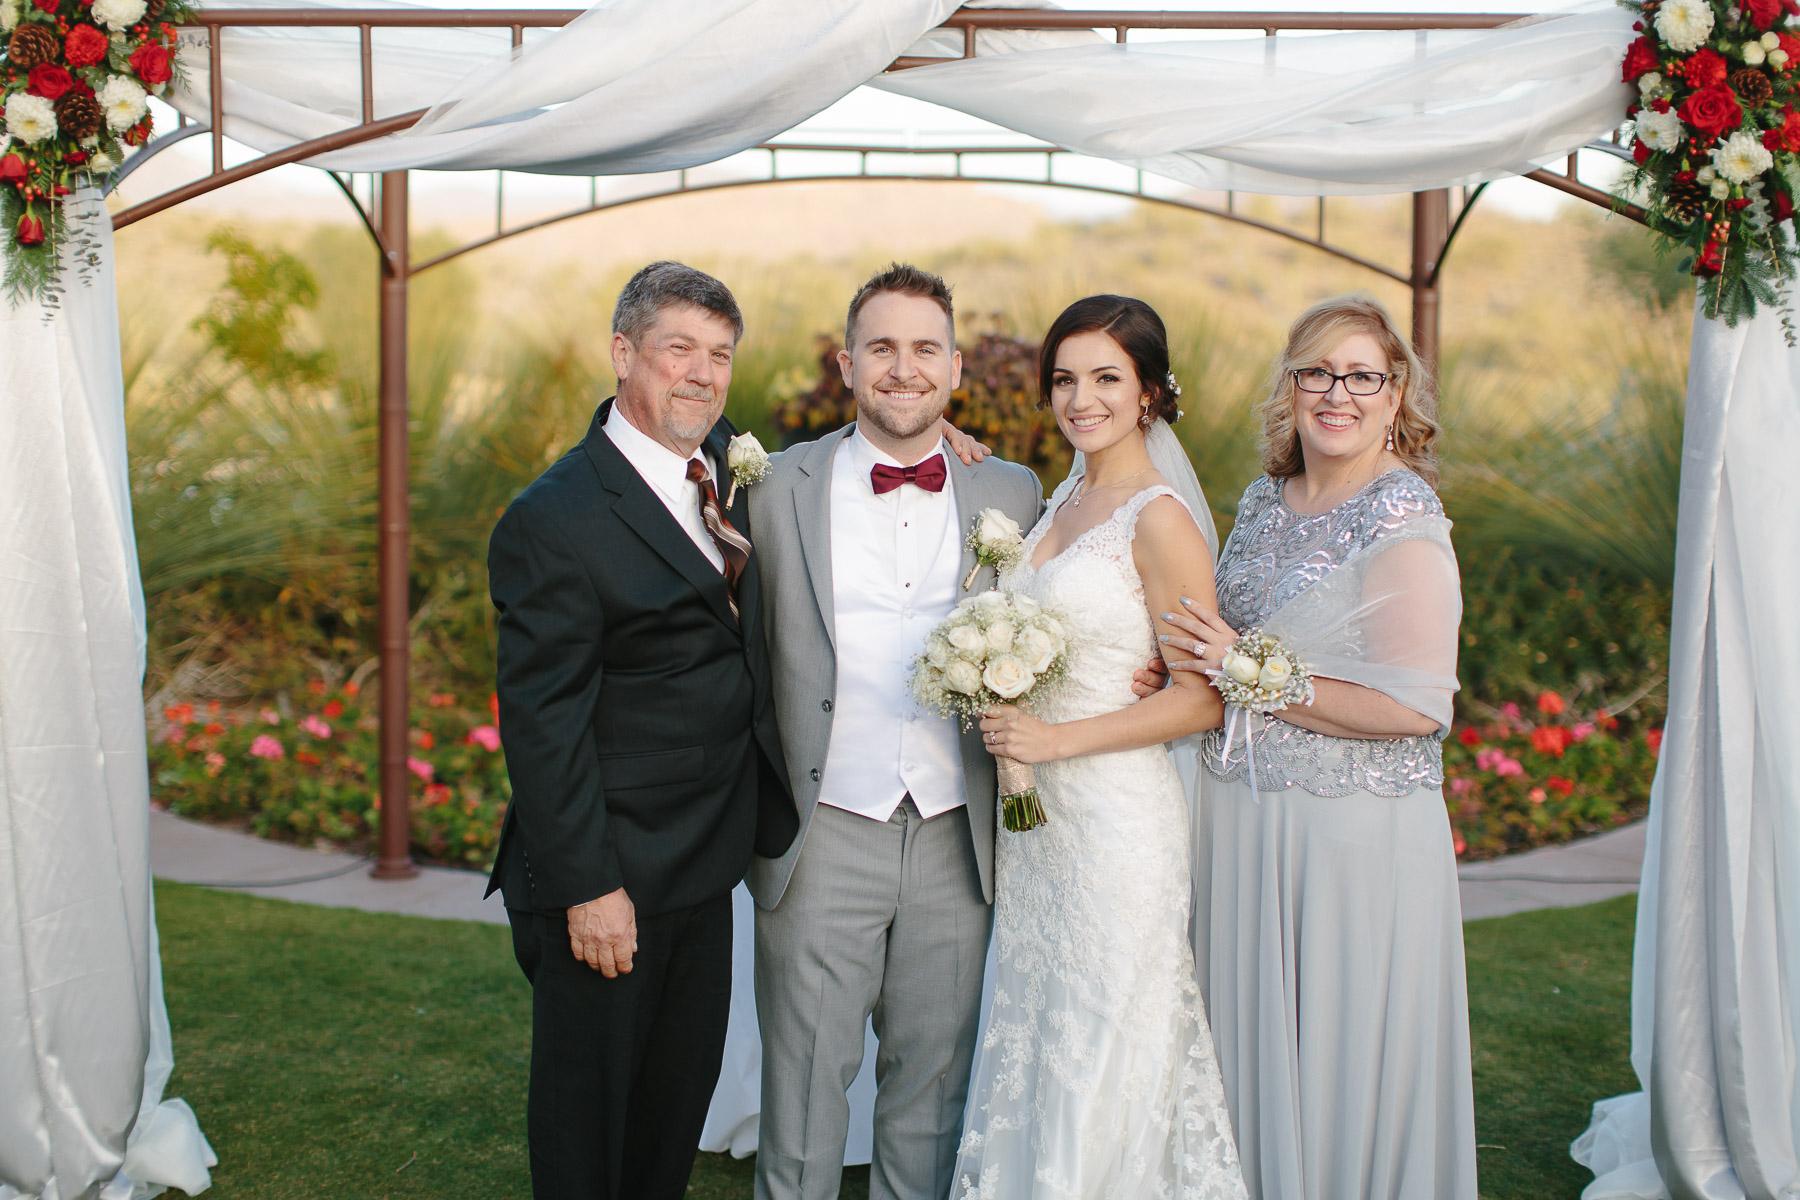 161210-Luxium-Weddings-Arizona-Matt-Jenny-Anthem-Golf-Country-Club-1043.jpg